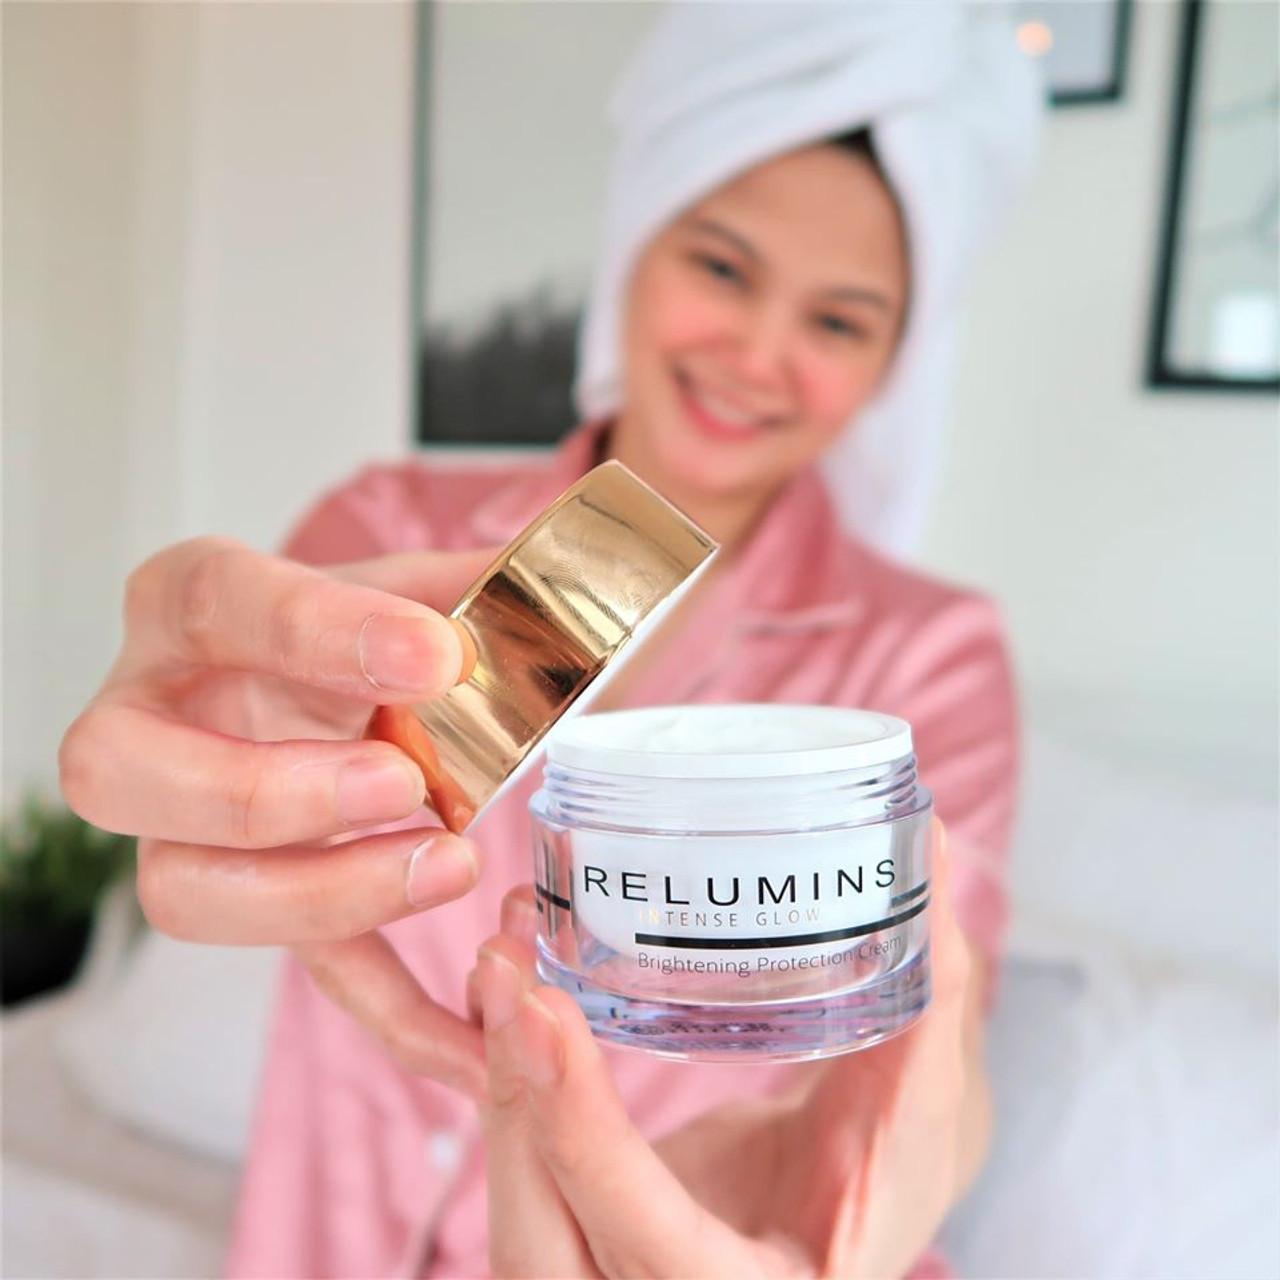 2x Relumins Intense Glow Brightening Protection Cream